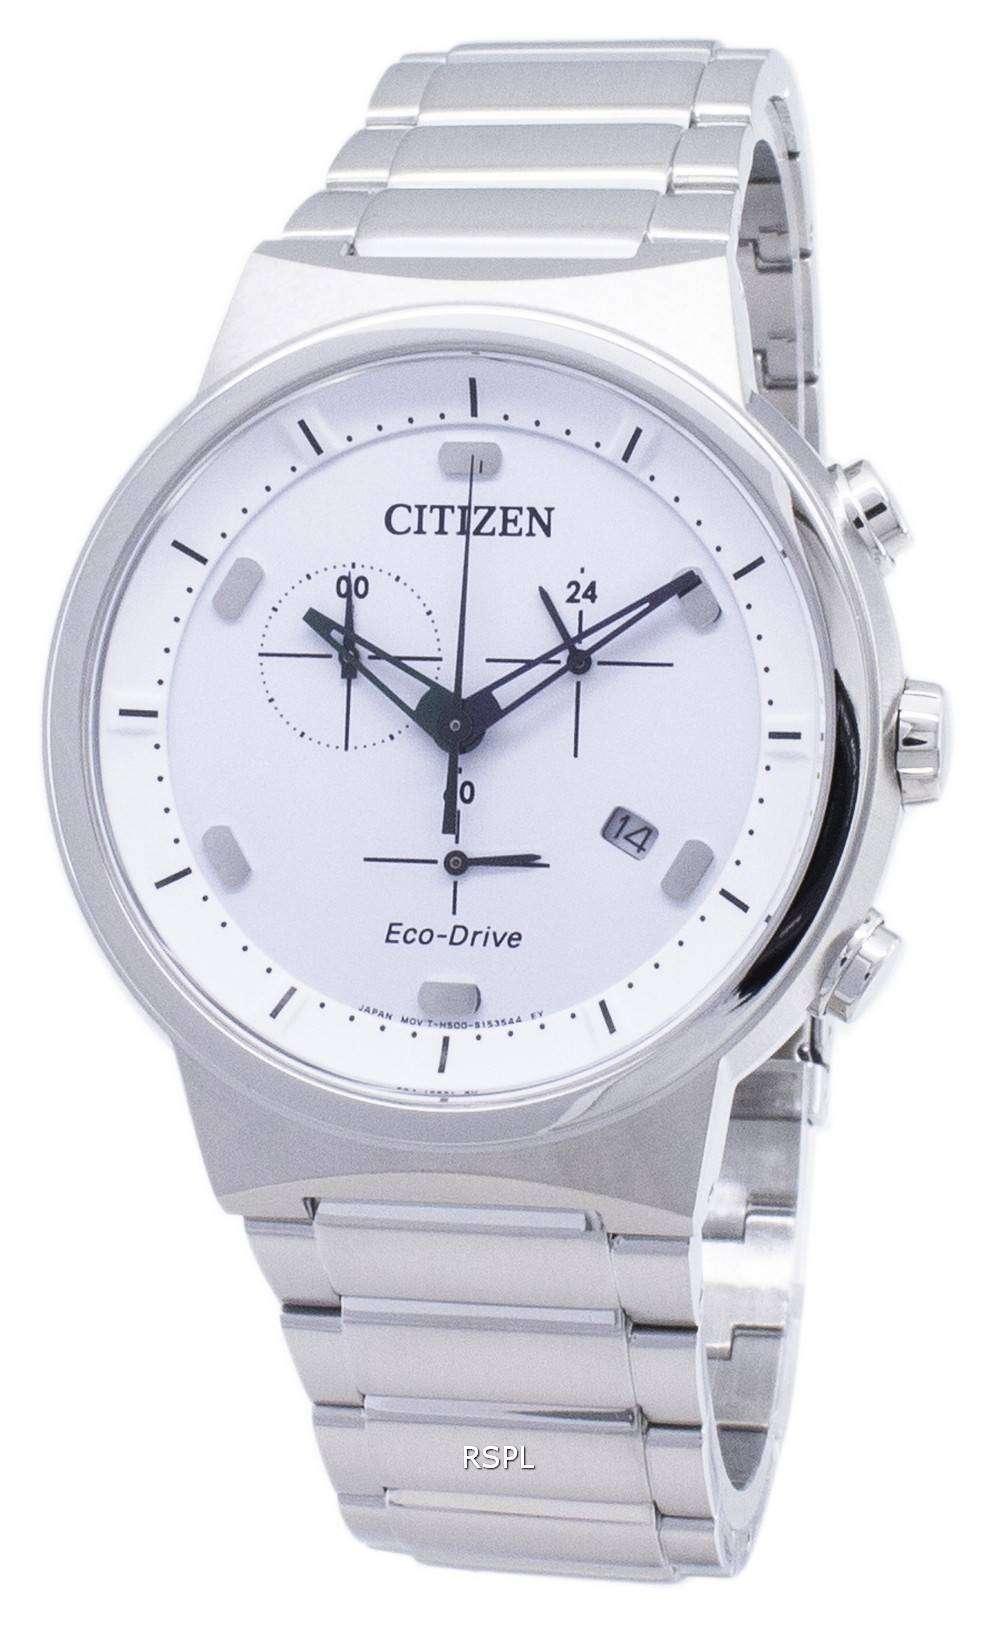 Citizen 시티즌 시계 에코 드라이브 AT2400-81A 크로 노 그래프 아날로그 남성용 손목시계